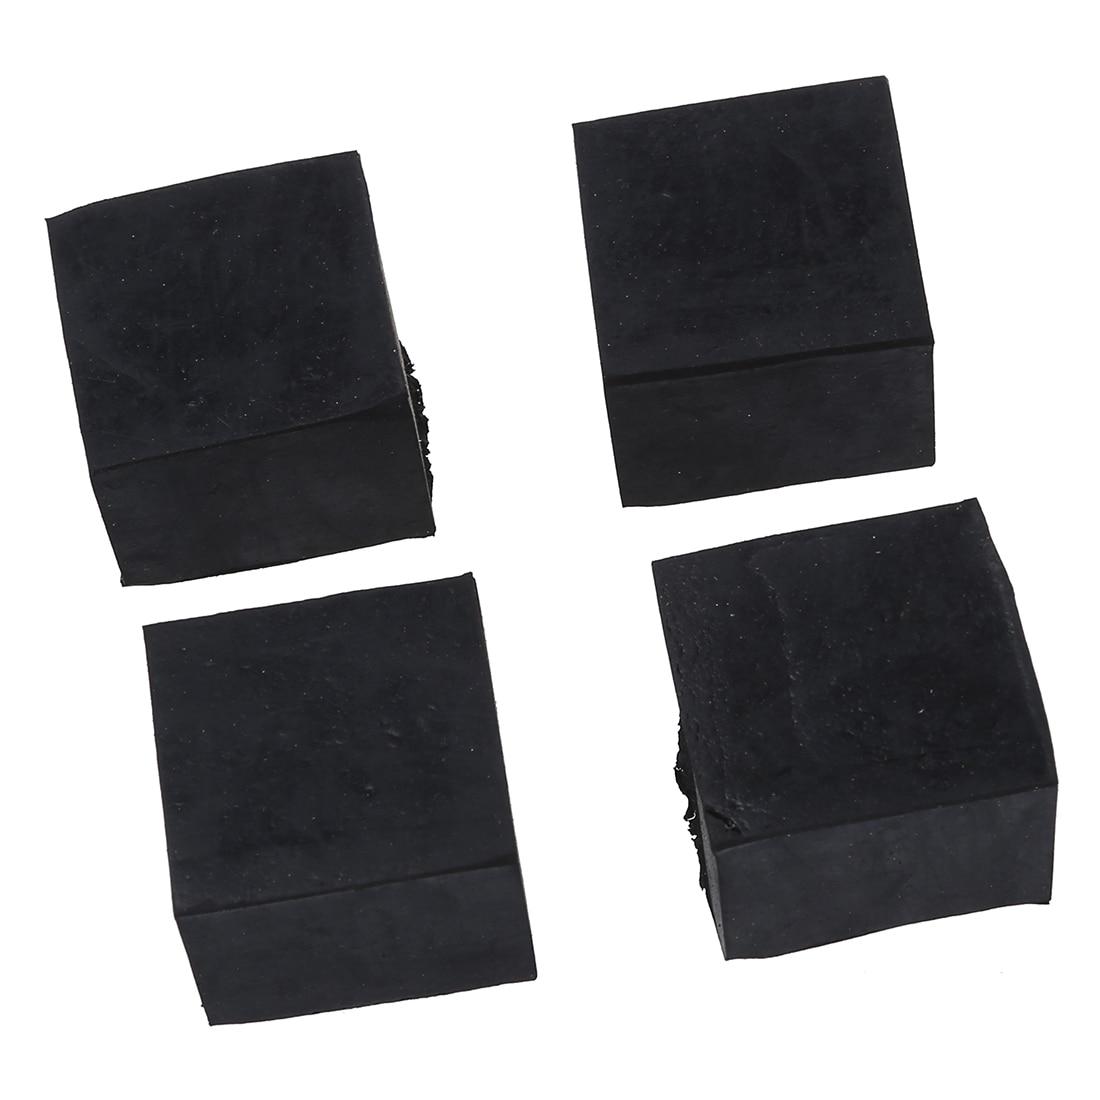 4 Pcs Black Chair Table Leg Rubber Foot Covers Protectors 28mm x 28mm